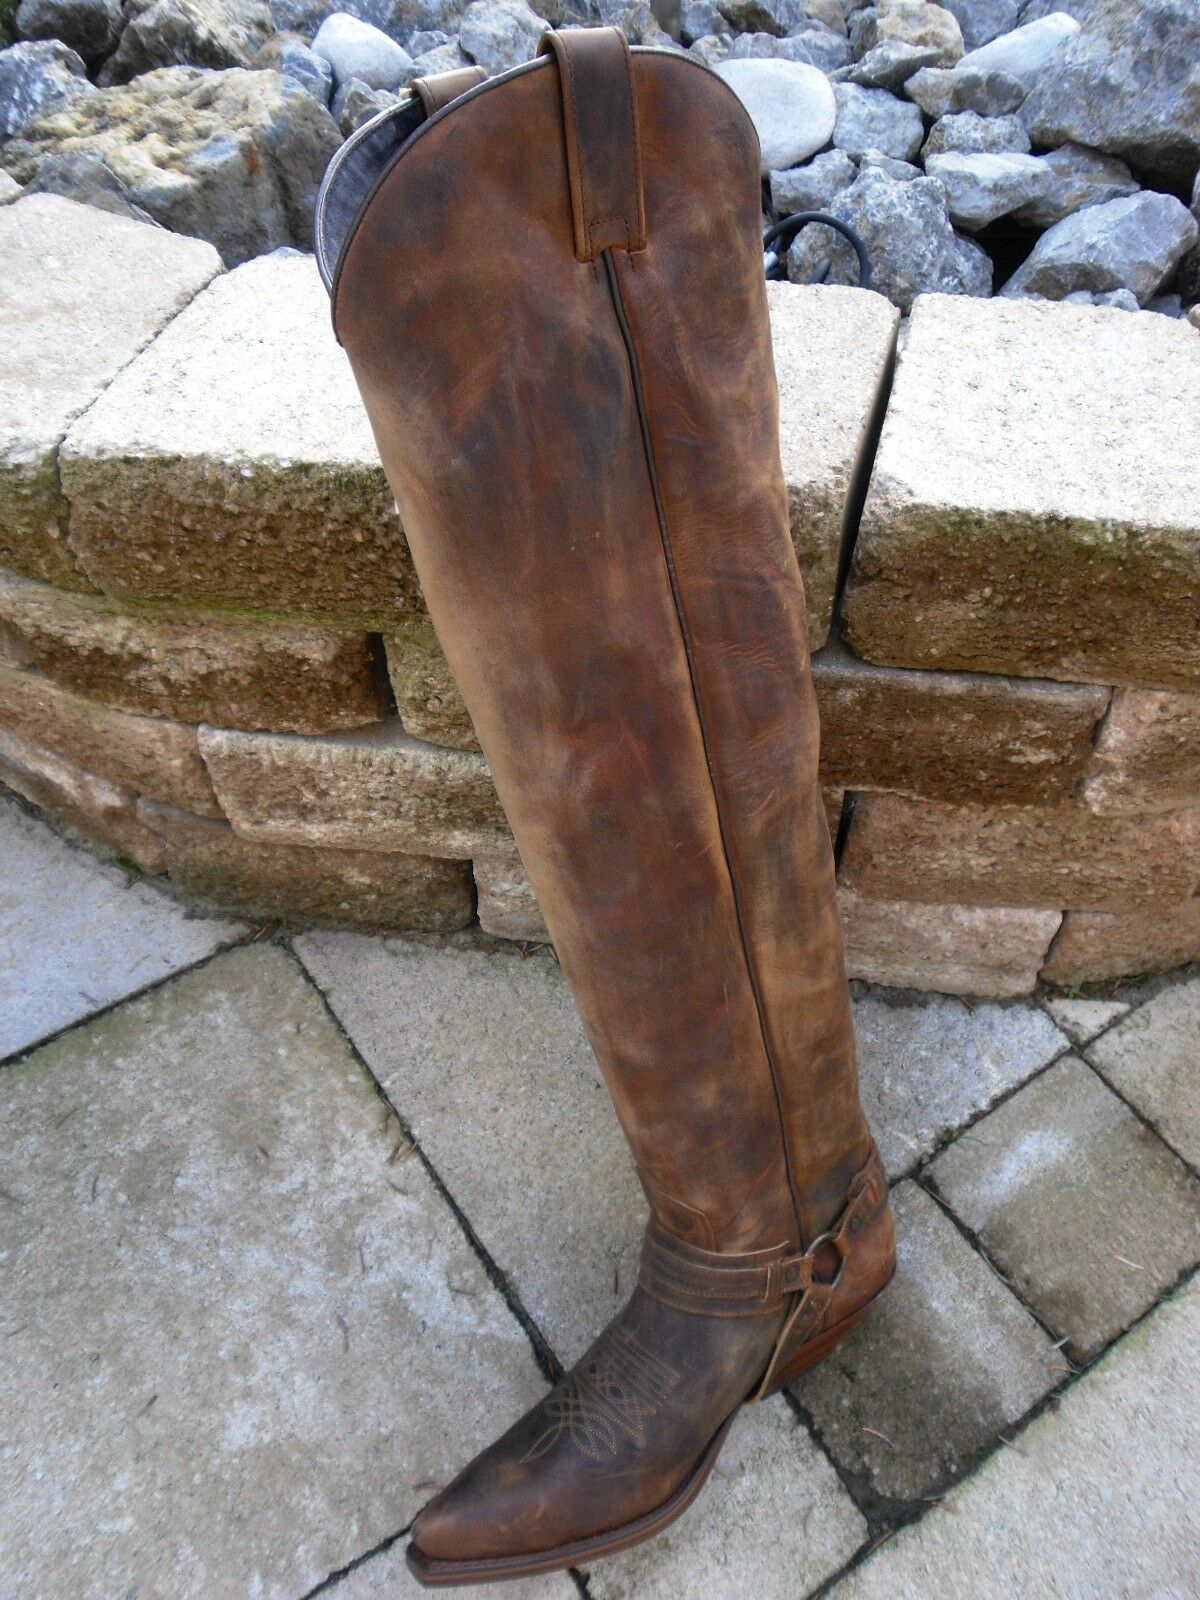 Sendra altamente gambale-Western Stivali 10757-Cuervo antico Marroneee (M.D. T.L.) TG 9 = 43